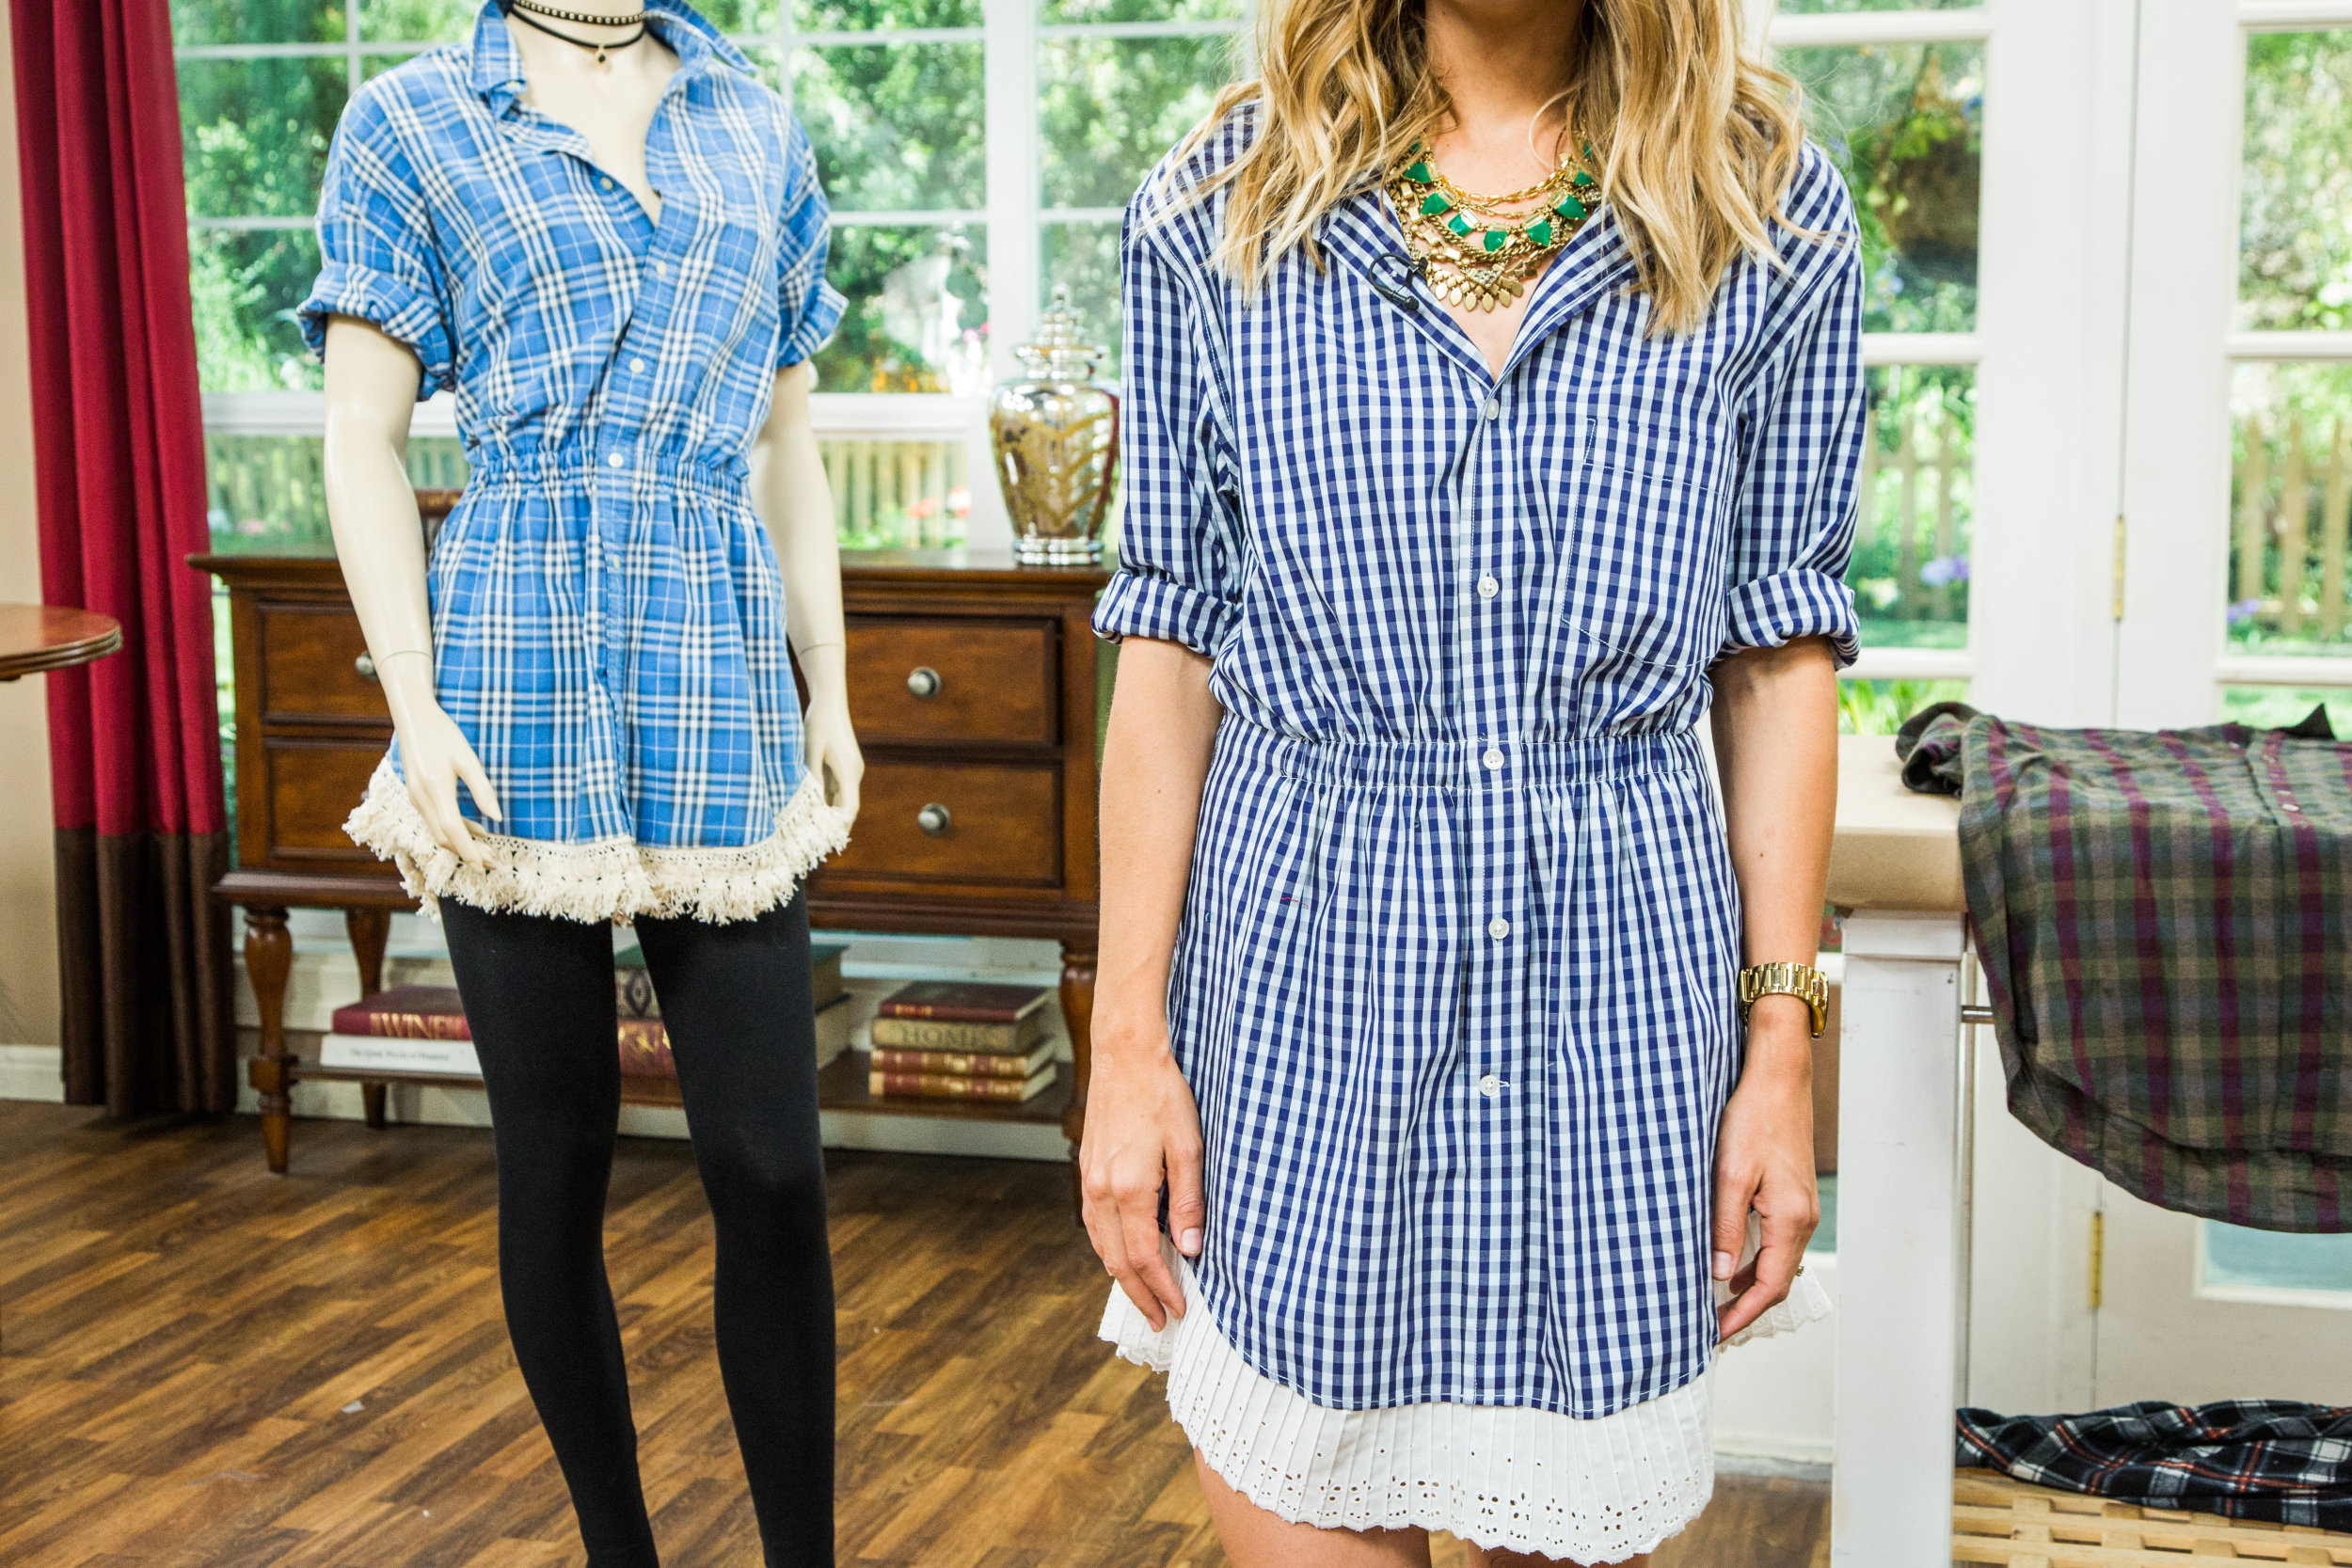 How to home family diy shirt dress hallmark channel for Make a dress shirt